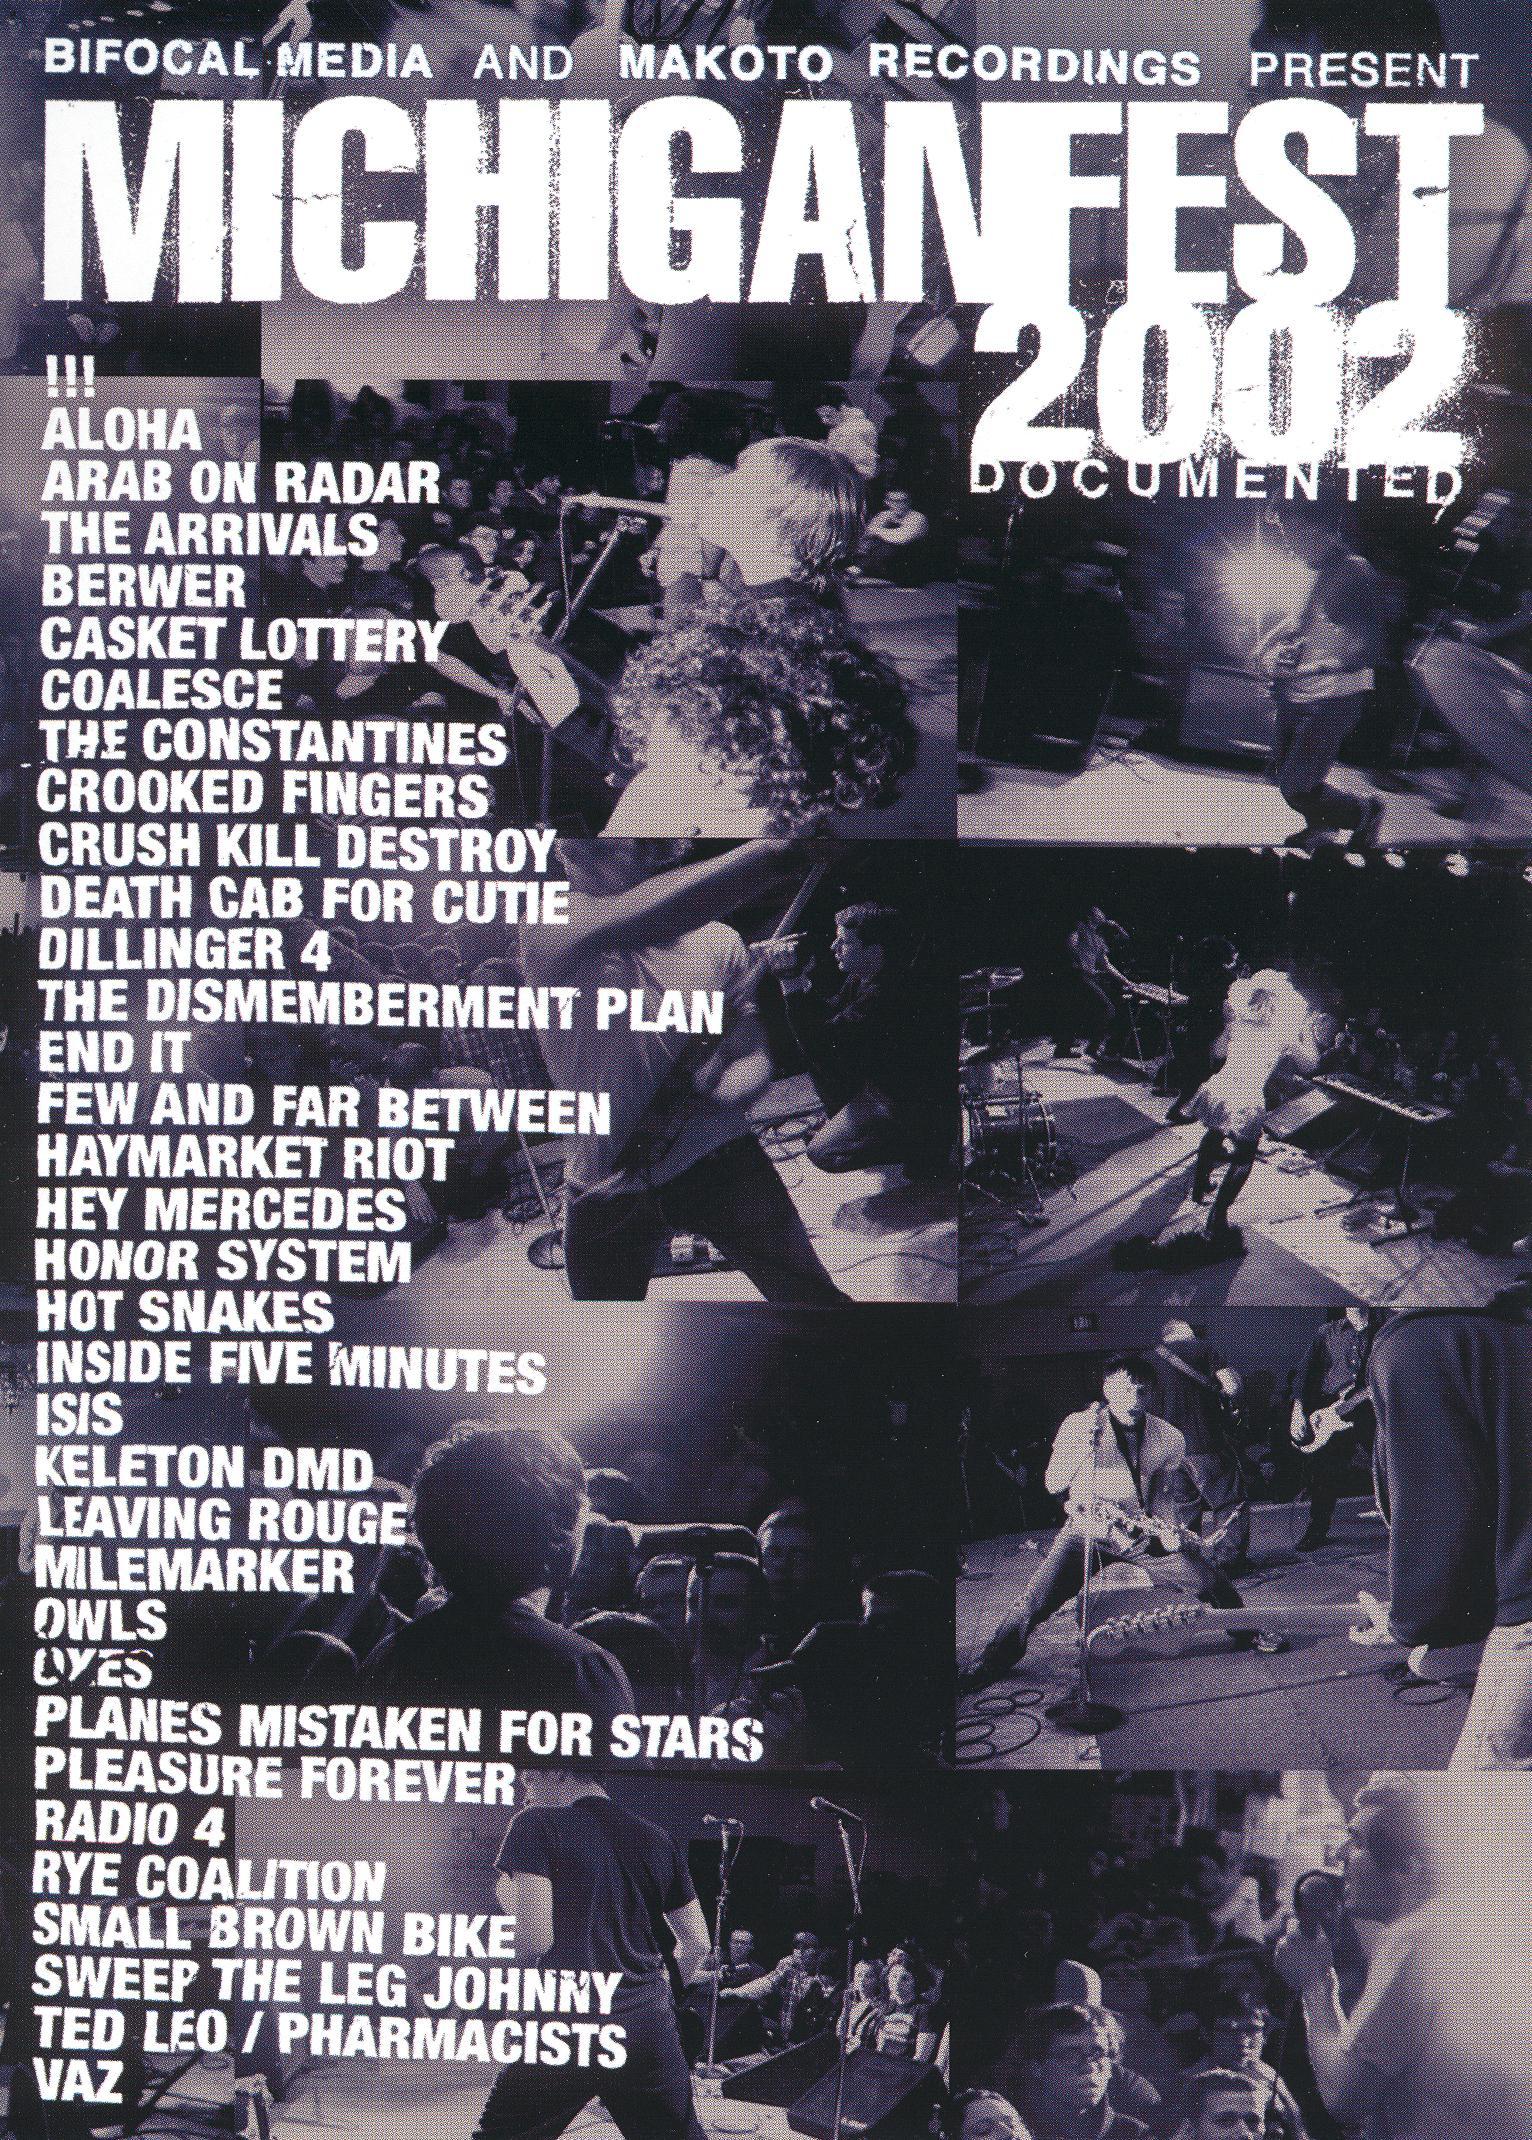 Michiganfest 2002